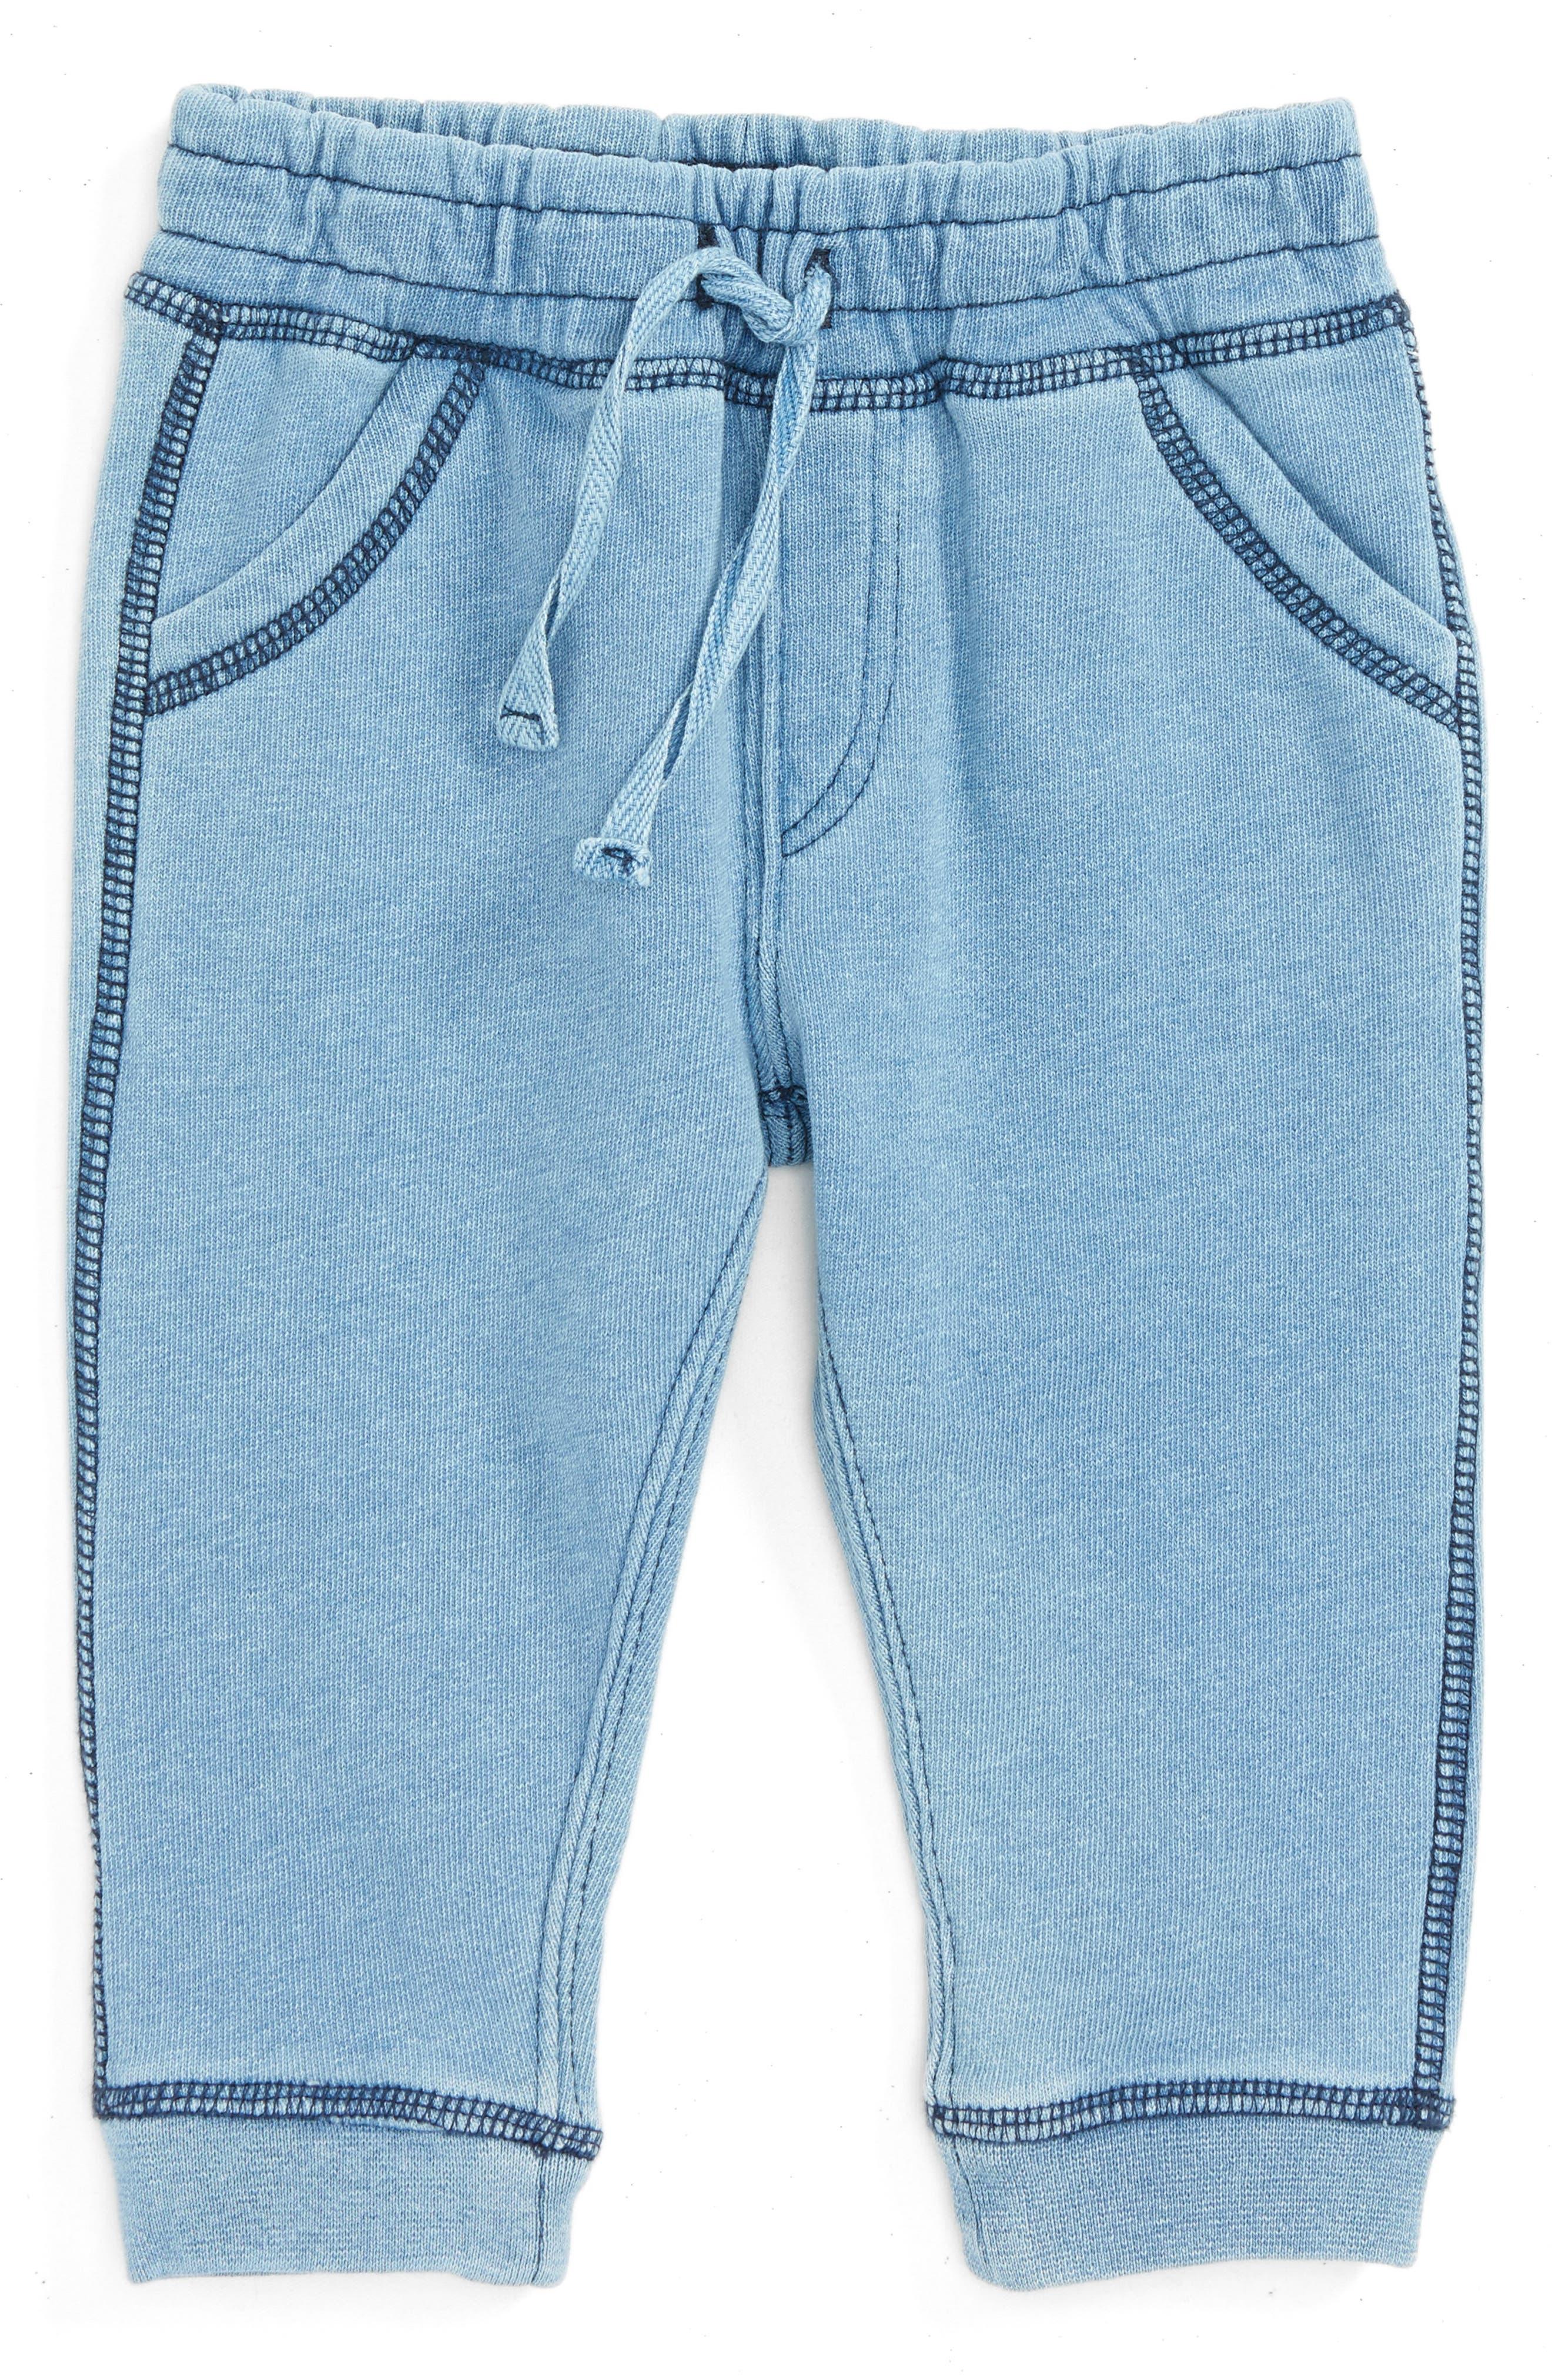 TUCKER + TATE, Knit Denim Pants, Main thumbnail 1, color, BLUE INDIGO